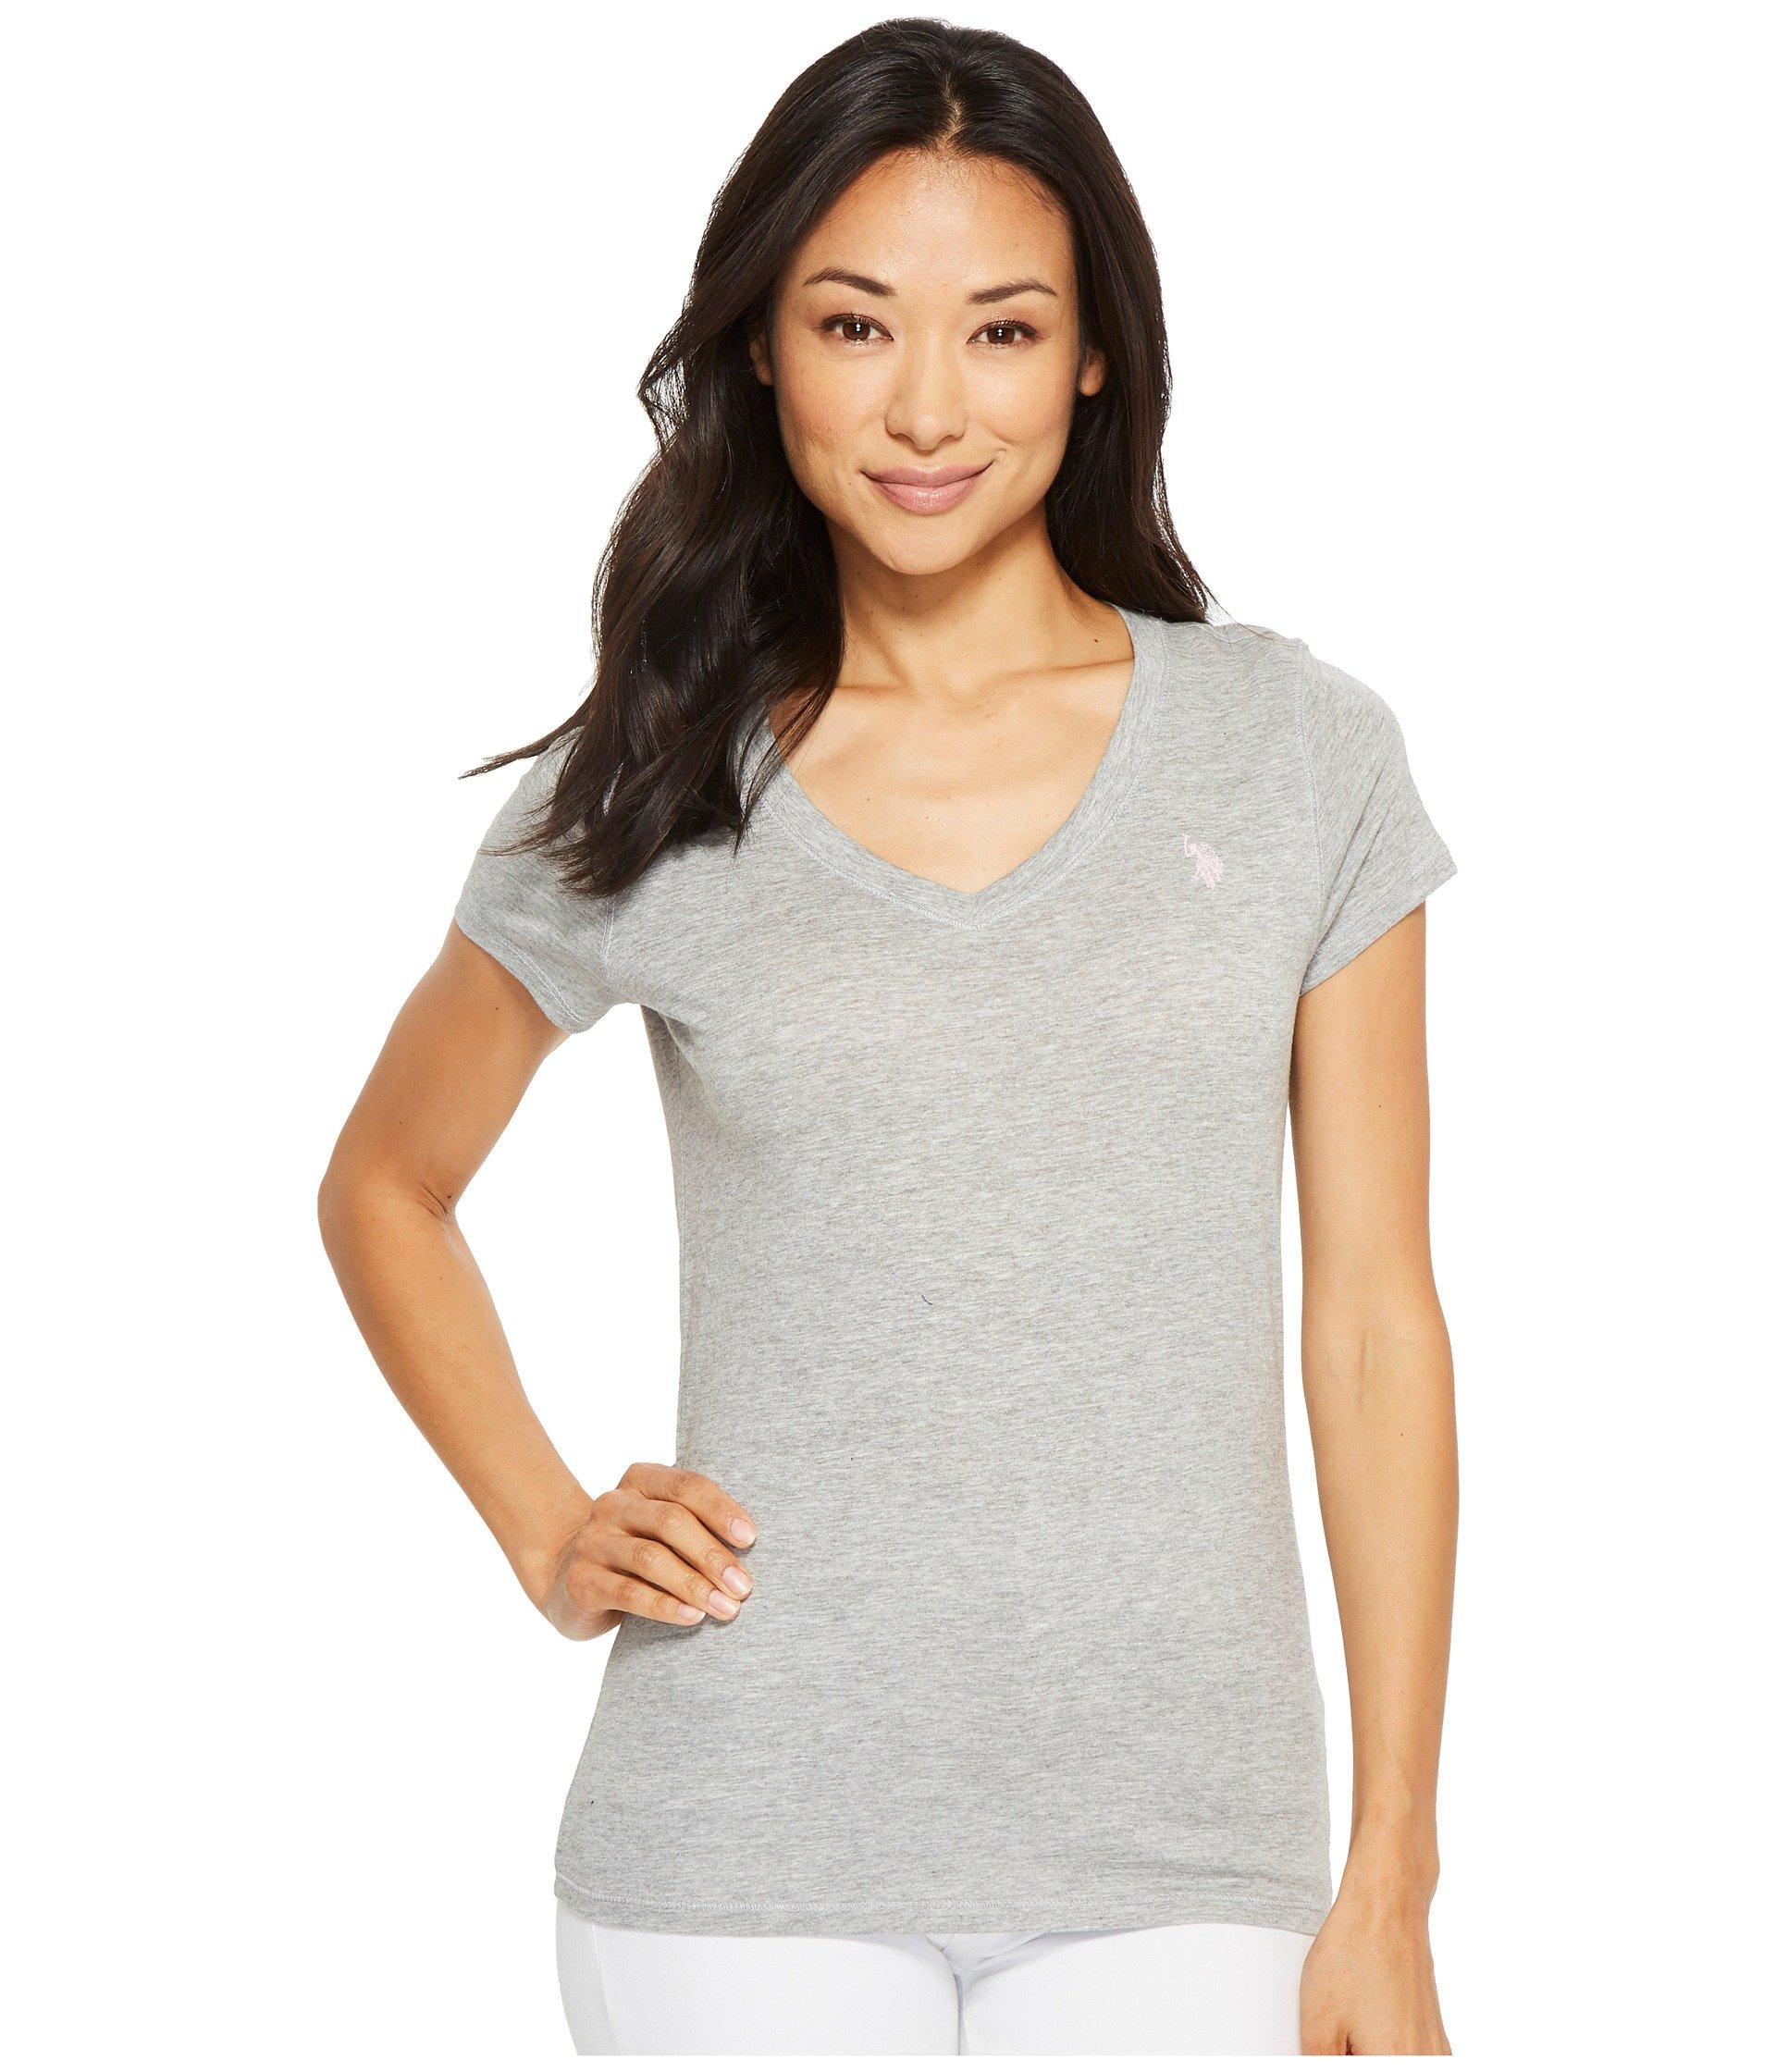 US Polo Assn Women's Short Sleeve V-Neck T-Shirt, Heather Grey, L